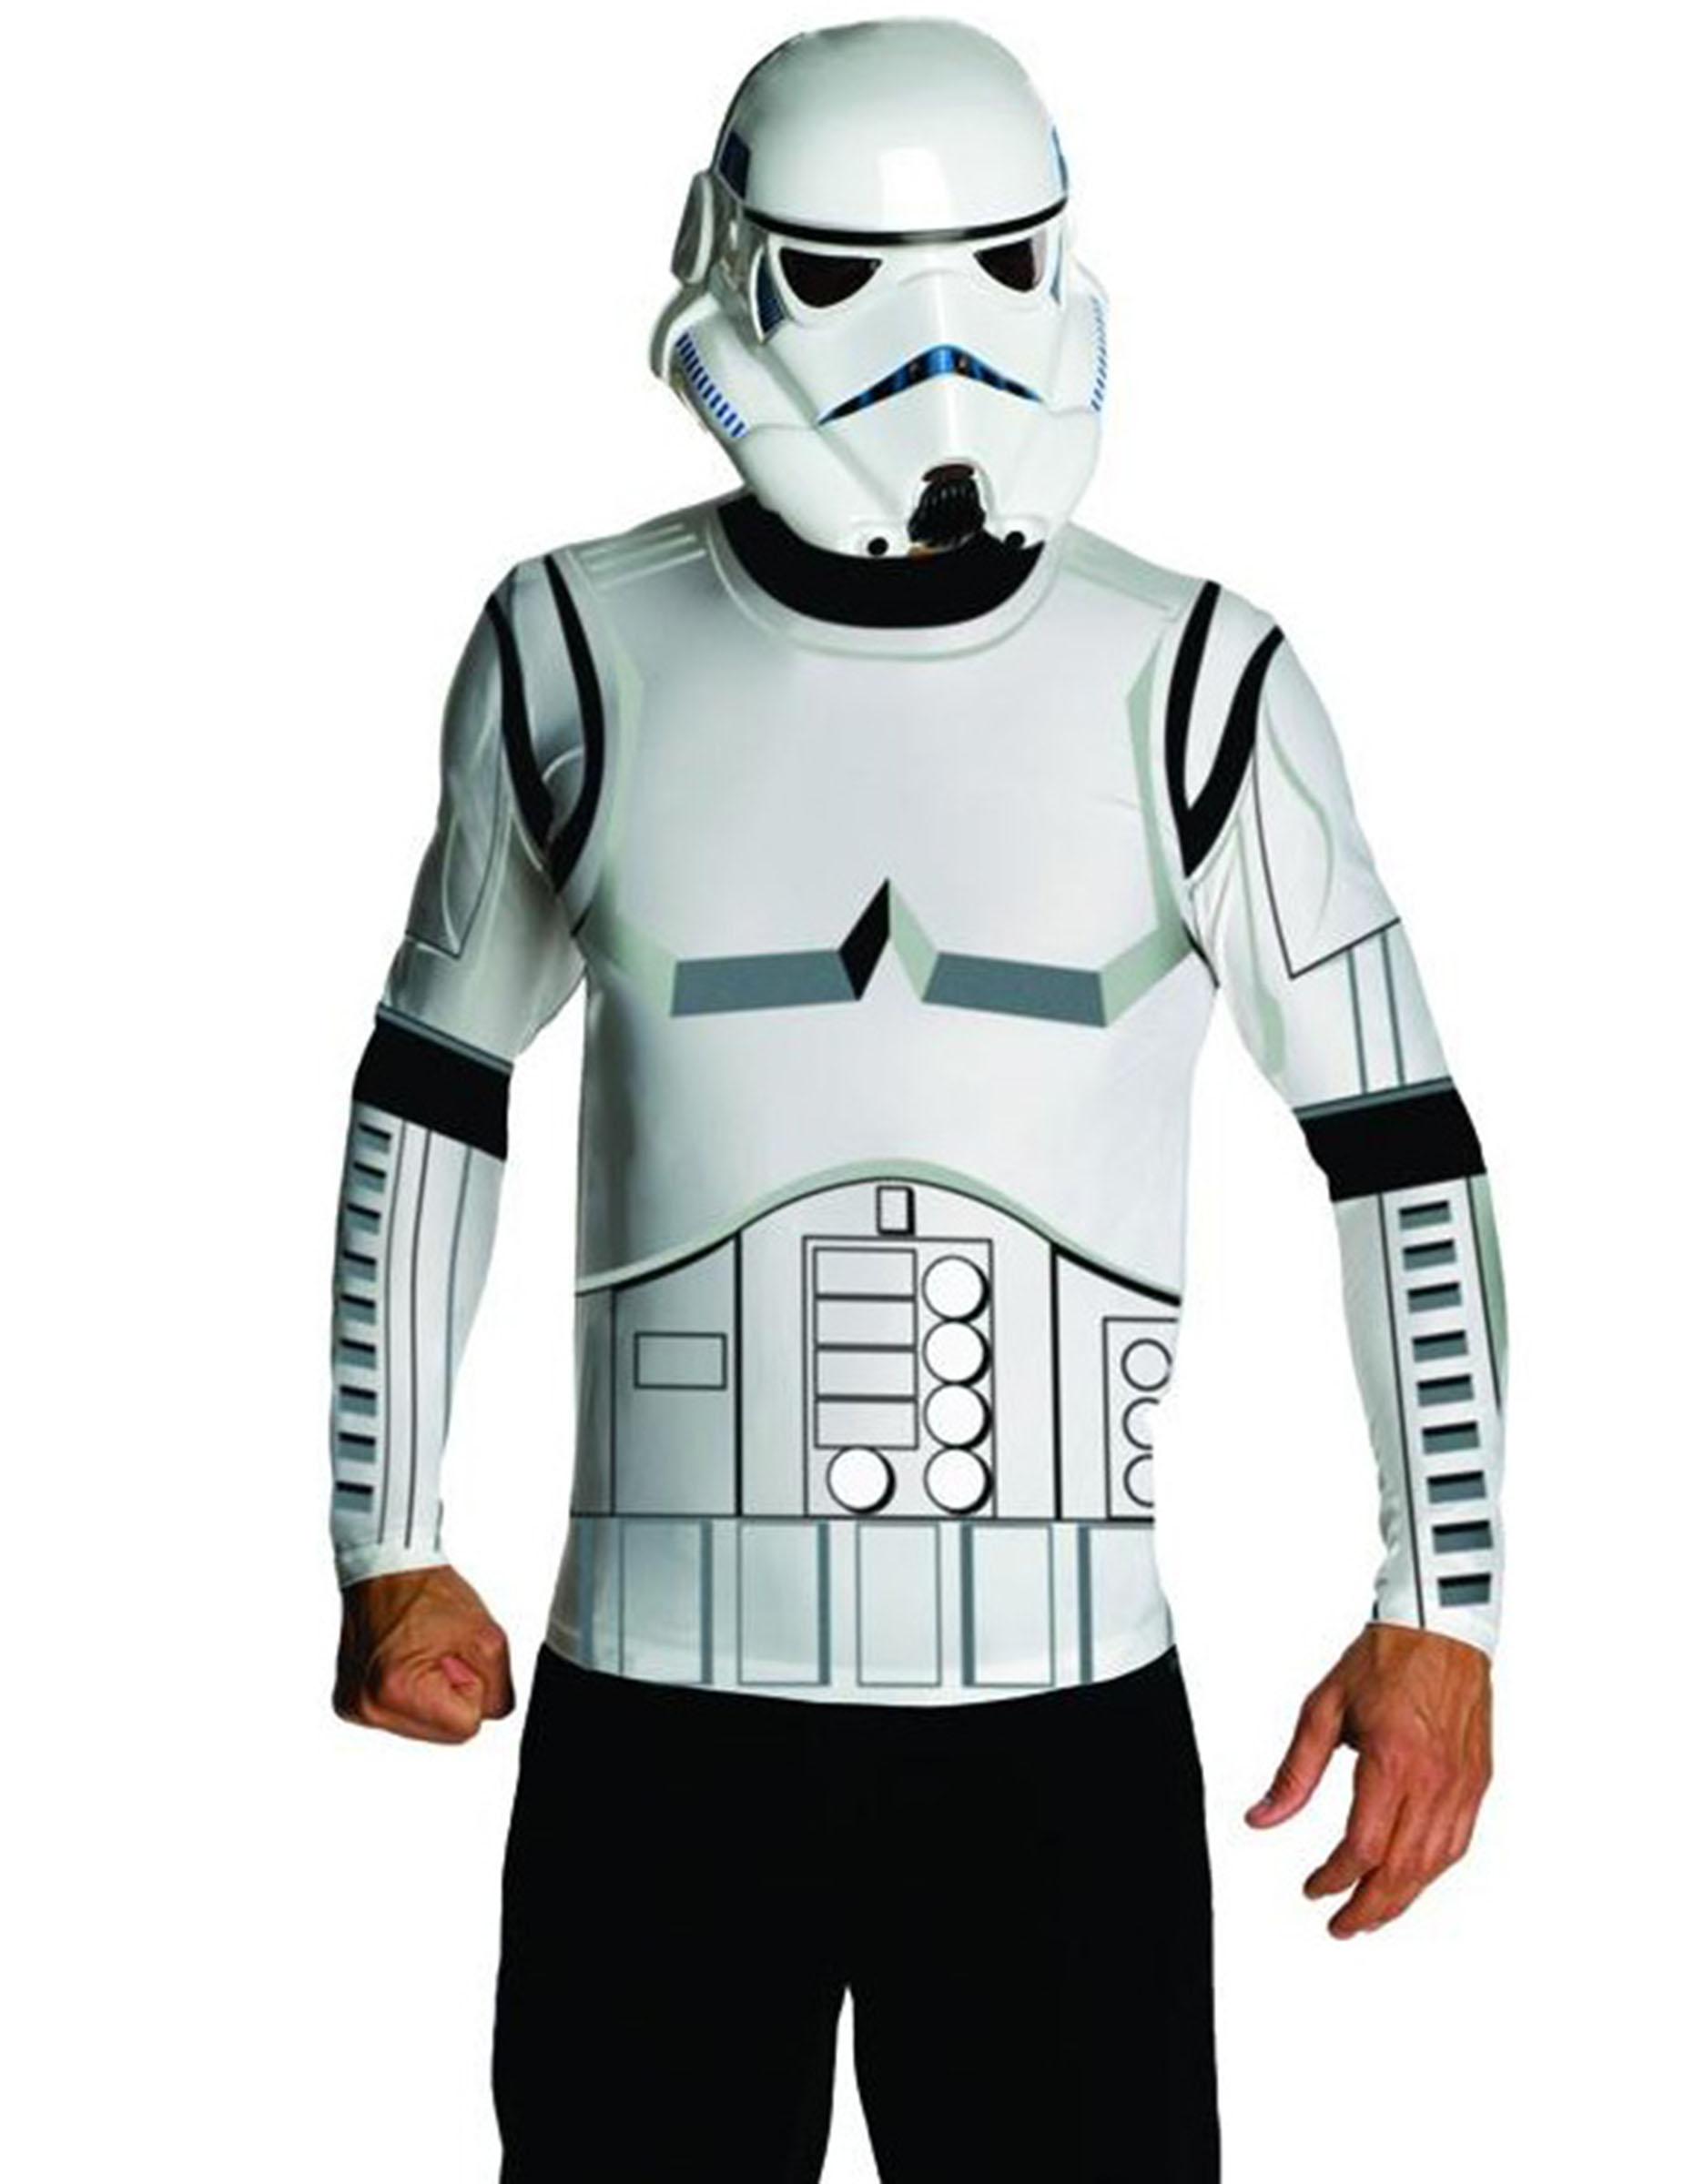 d guisement stormtrooper star wars adulte deguise toi. Black Bedroom Furniture Sets. Home Design Ideas